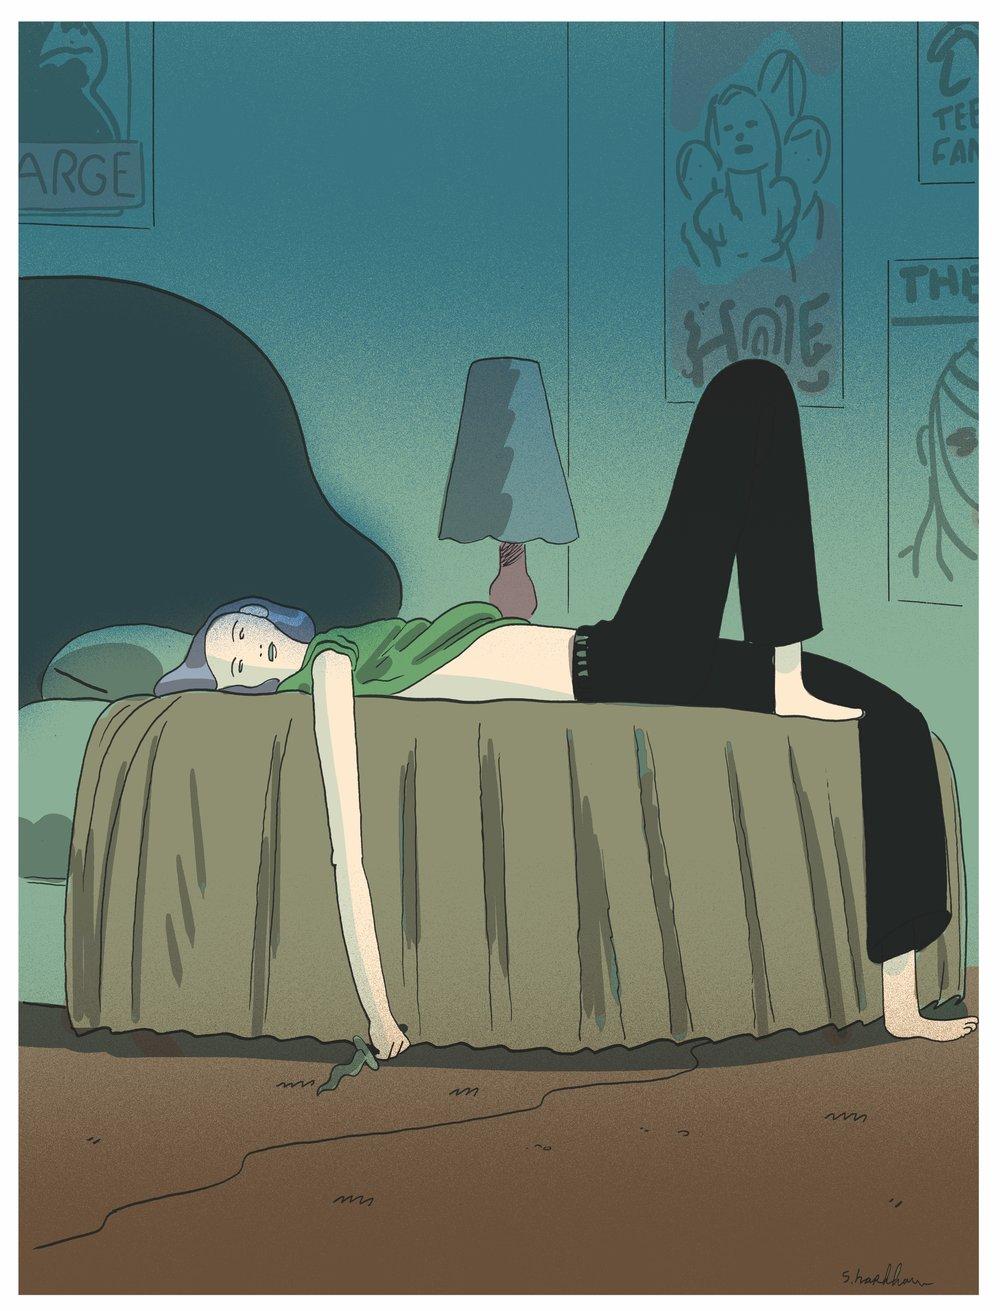 Carhartt_WIP_x_Brain_Dead_Sammy_Harkham_Comic_04.jpg